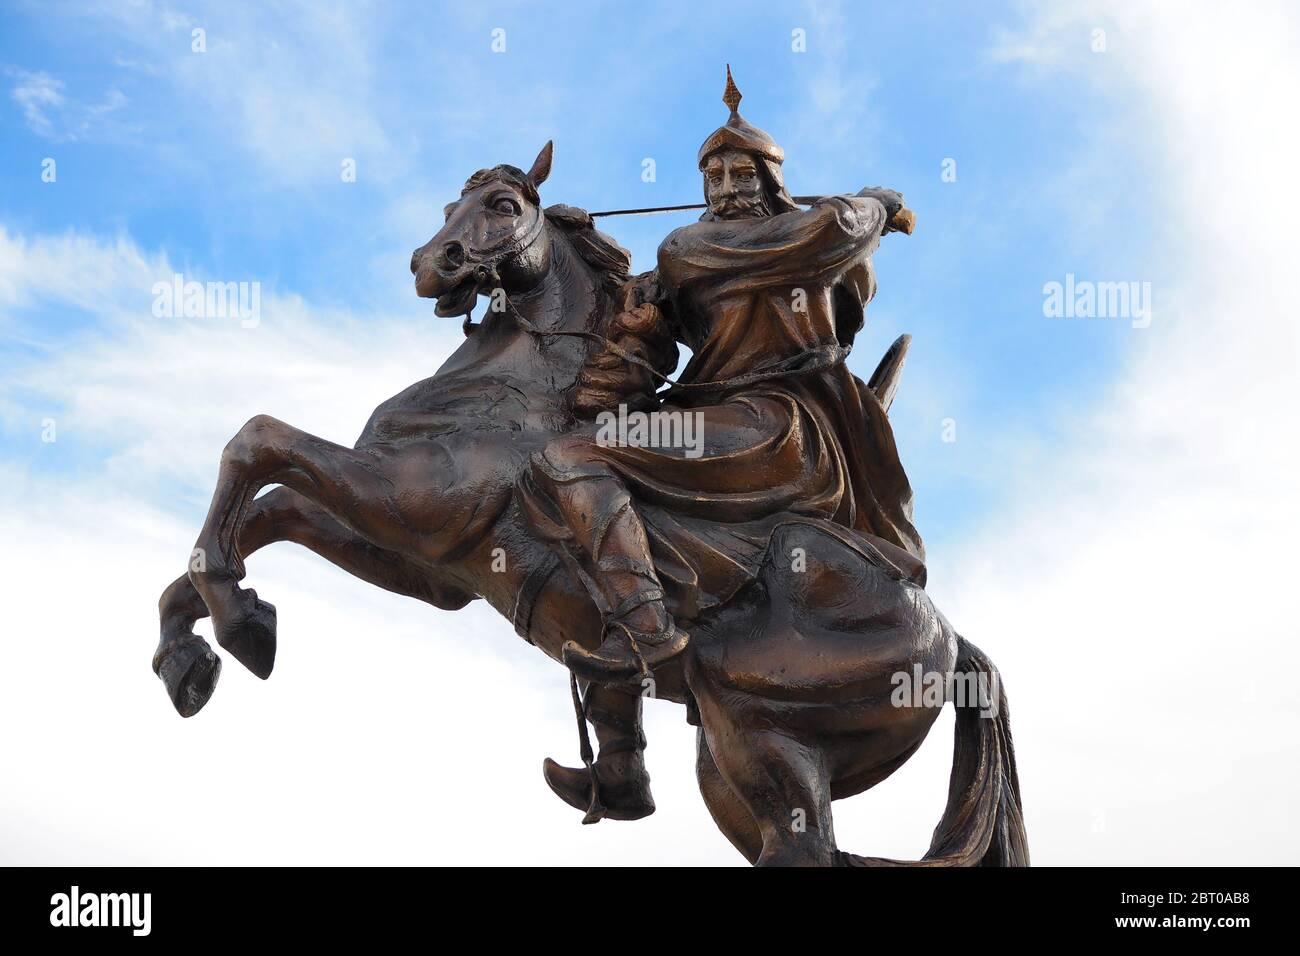 Statue of the famous warrior Saladin (Salah ad-Din) in front of the fortress of Kerak ( Al Karak), Jordan Stock Photo